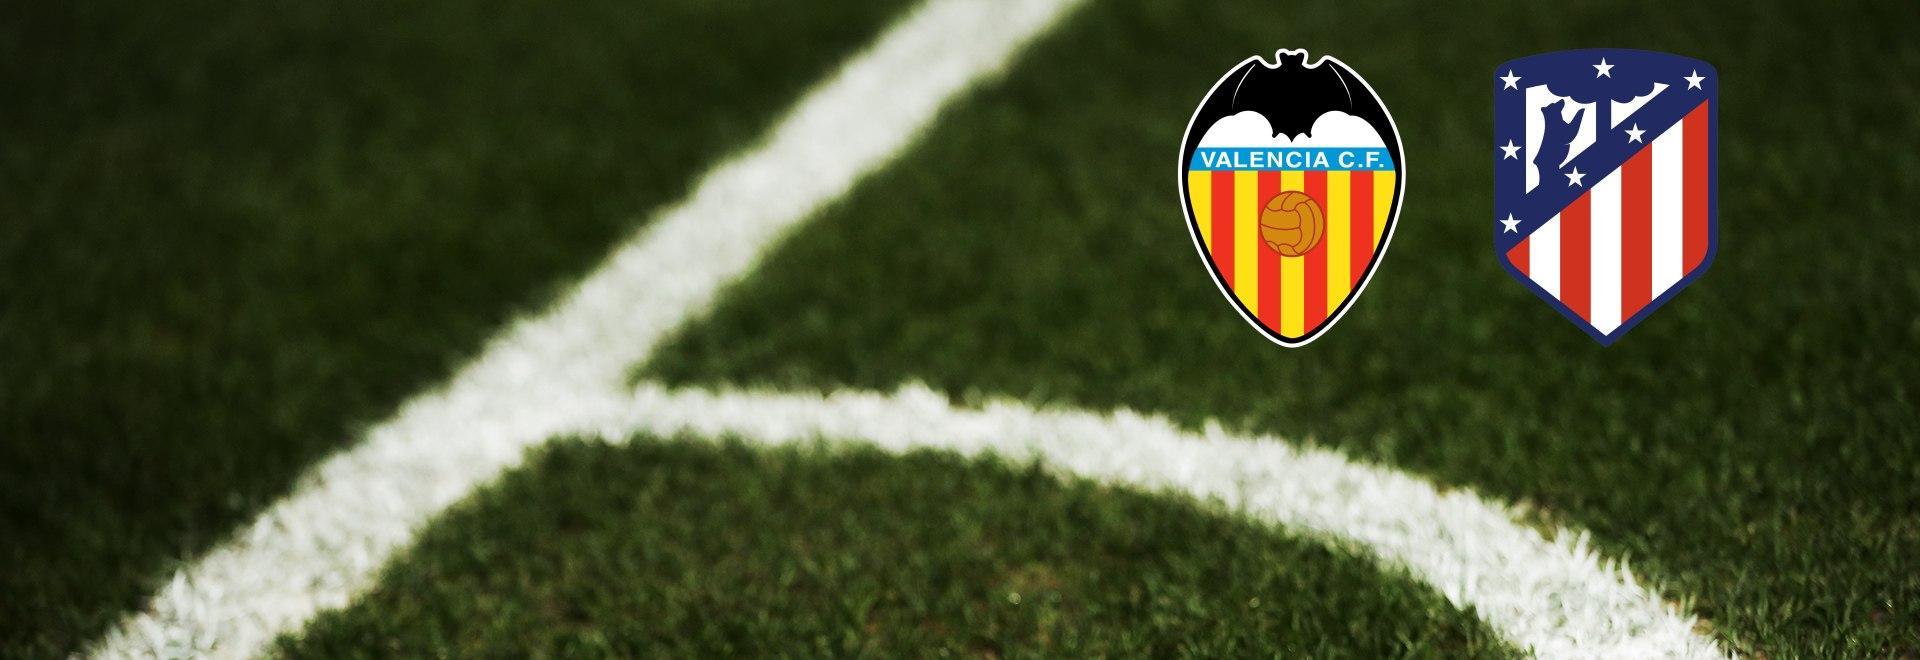 Valencia - Atlético Madrid. 24a g.